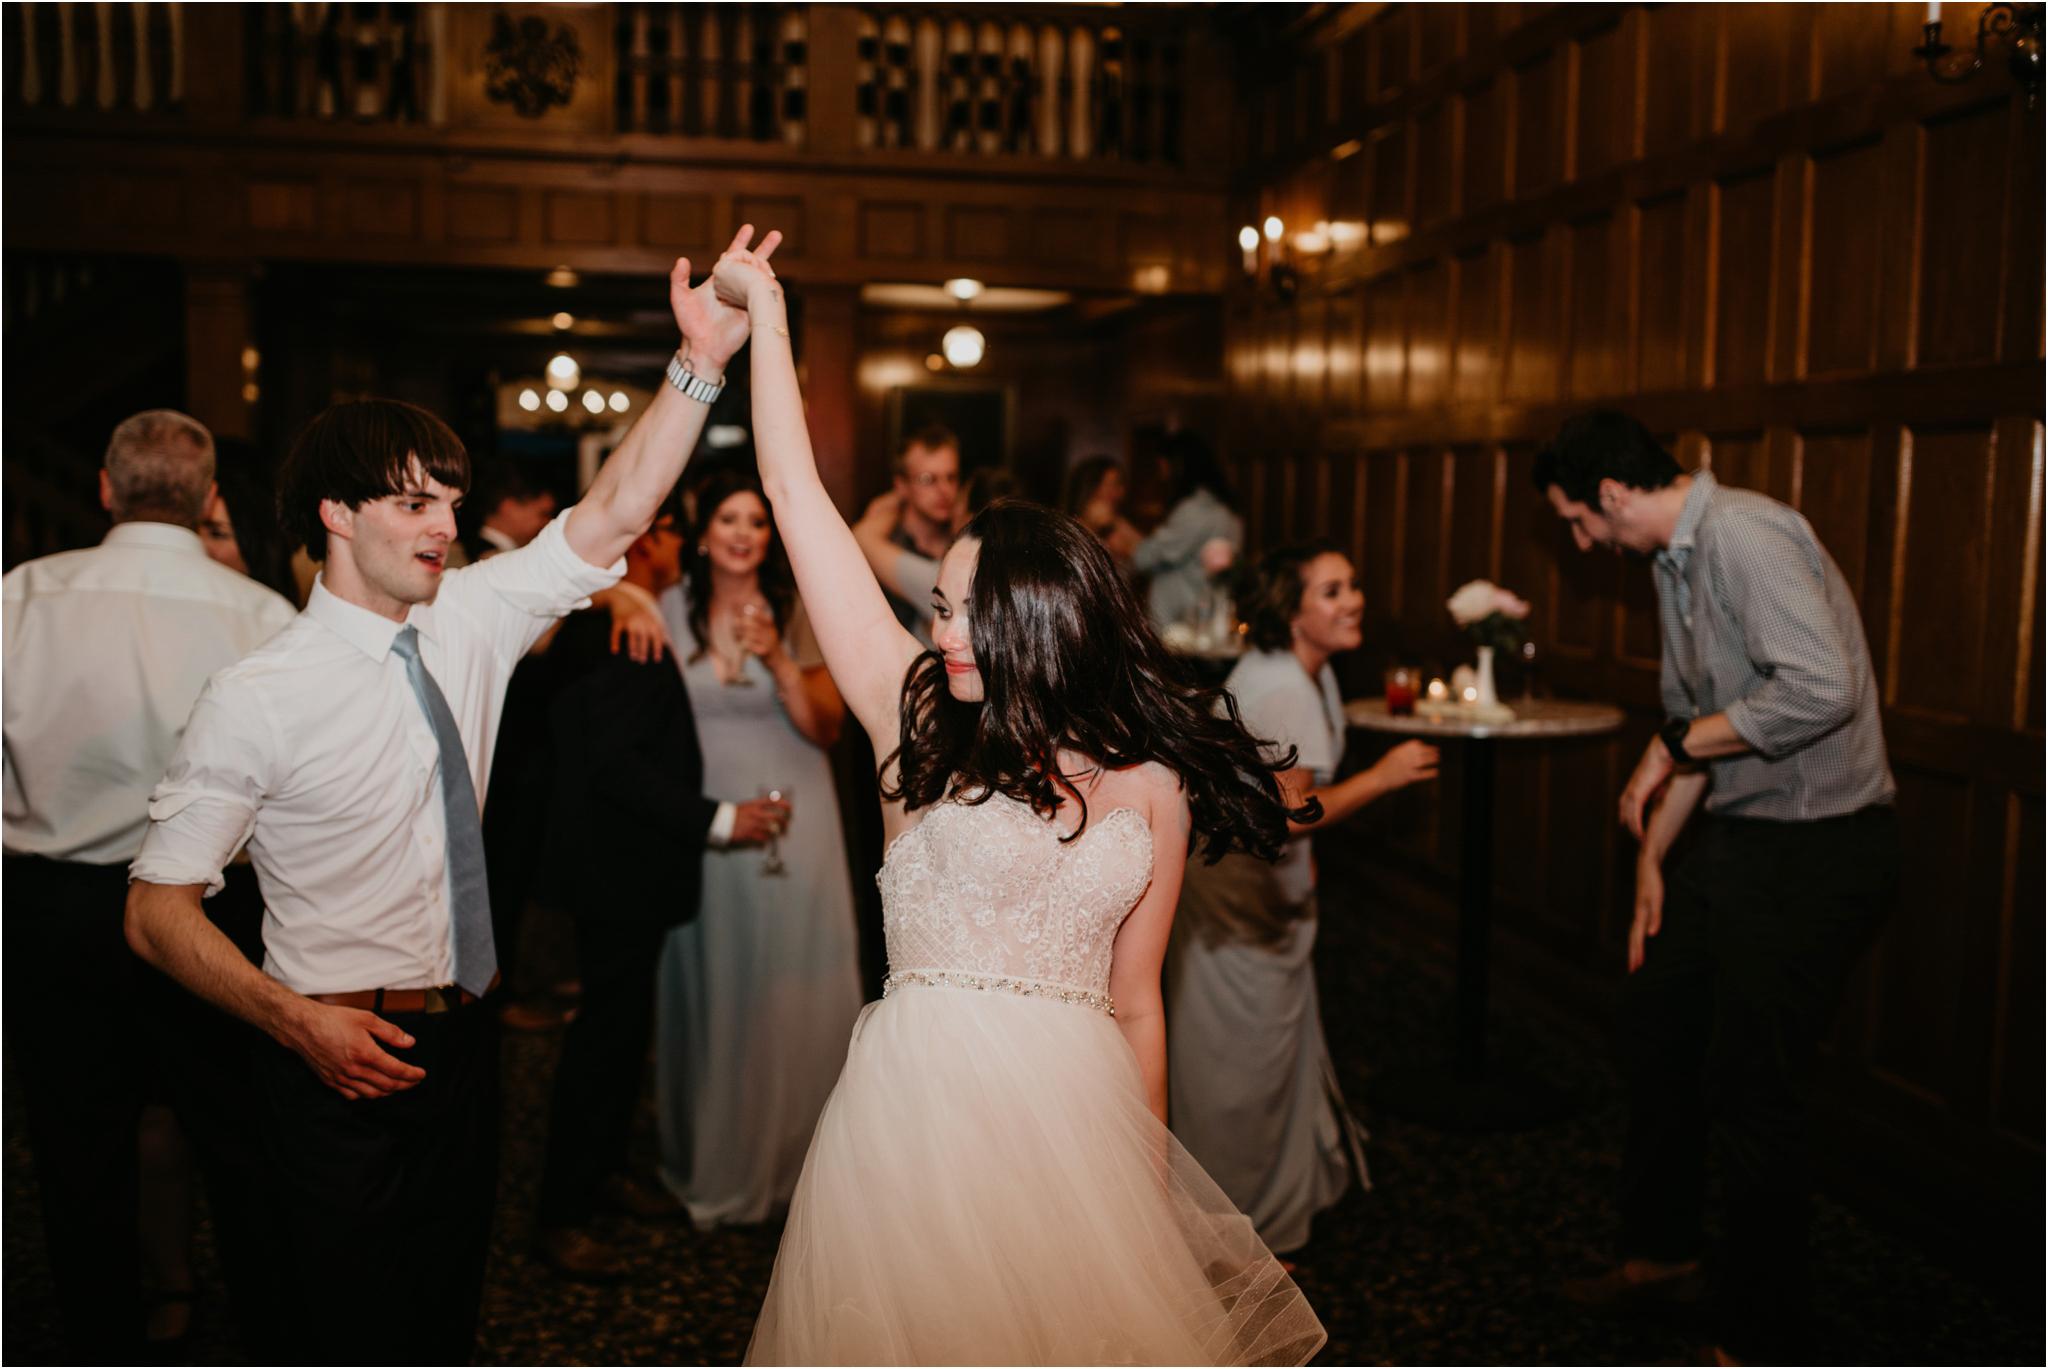 chance-and-ondrea-lairmont-manor-wedding-seattle-photographer-149.jpg